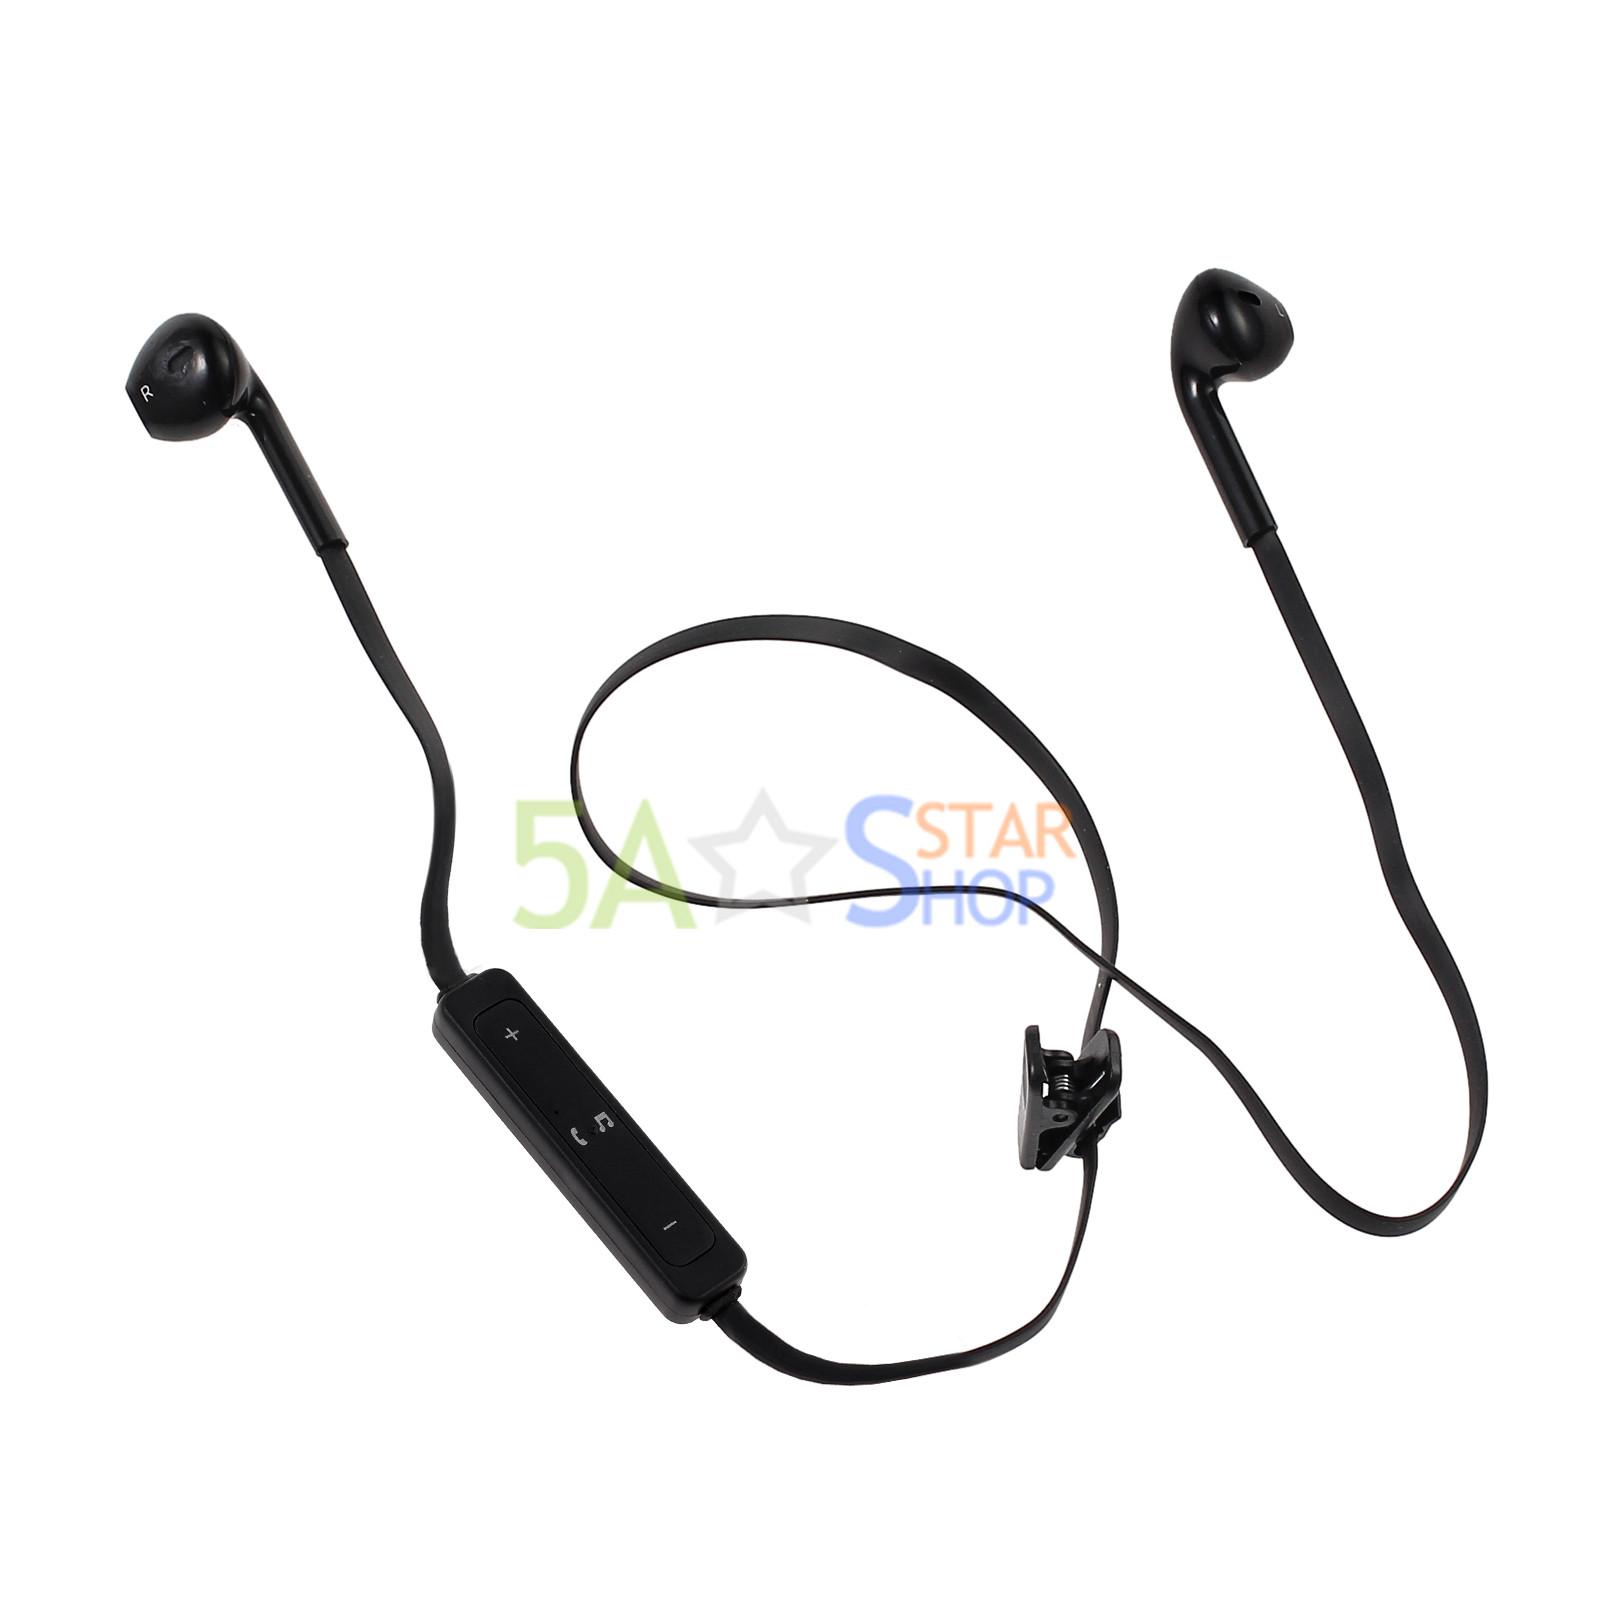 bluetooth wireless headset sport stereo headphone earphone. Black Bedroom Furniture Sets. Home Design Ideas